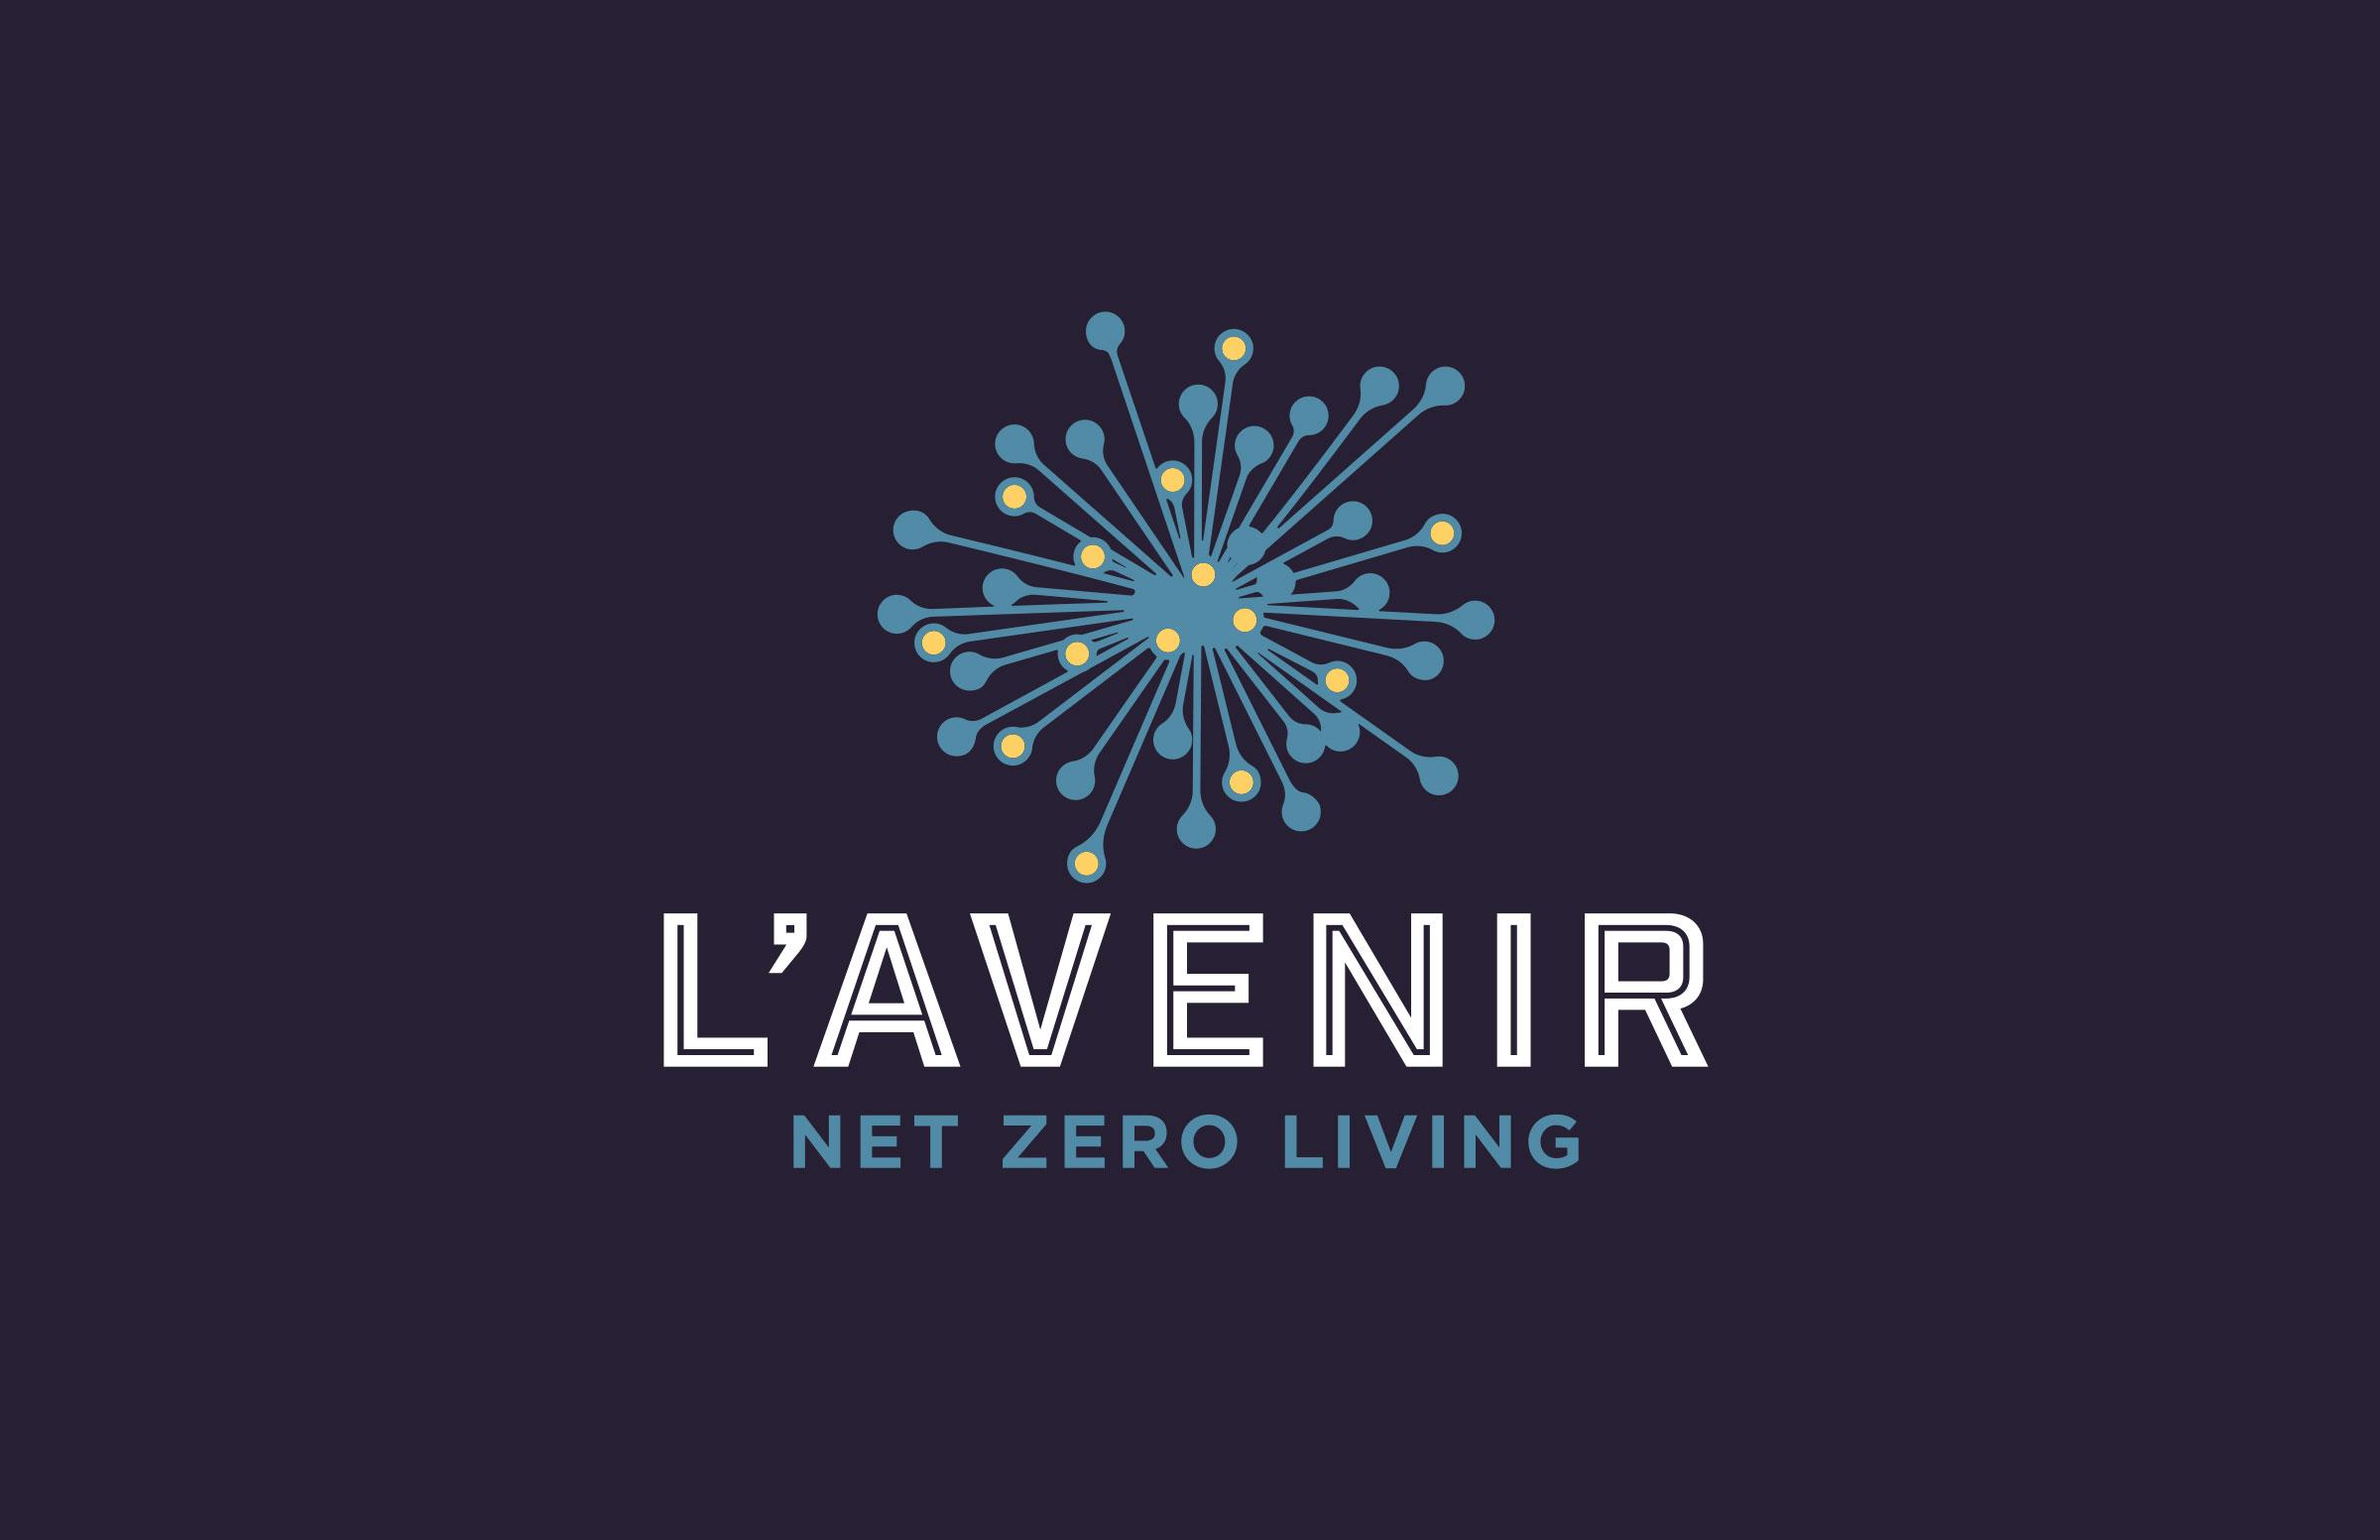 LAvenir_logo.jpg